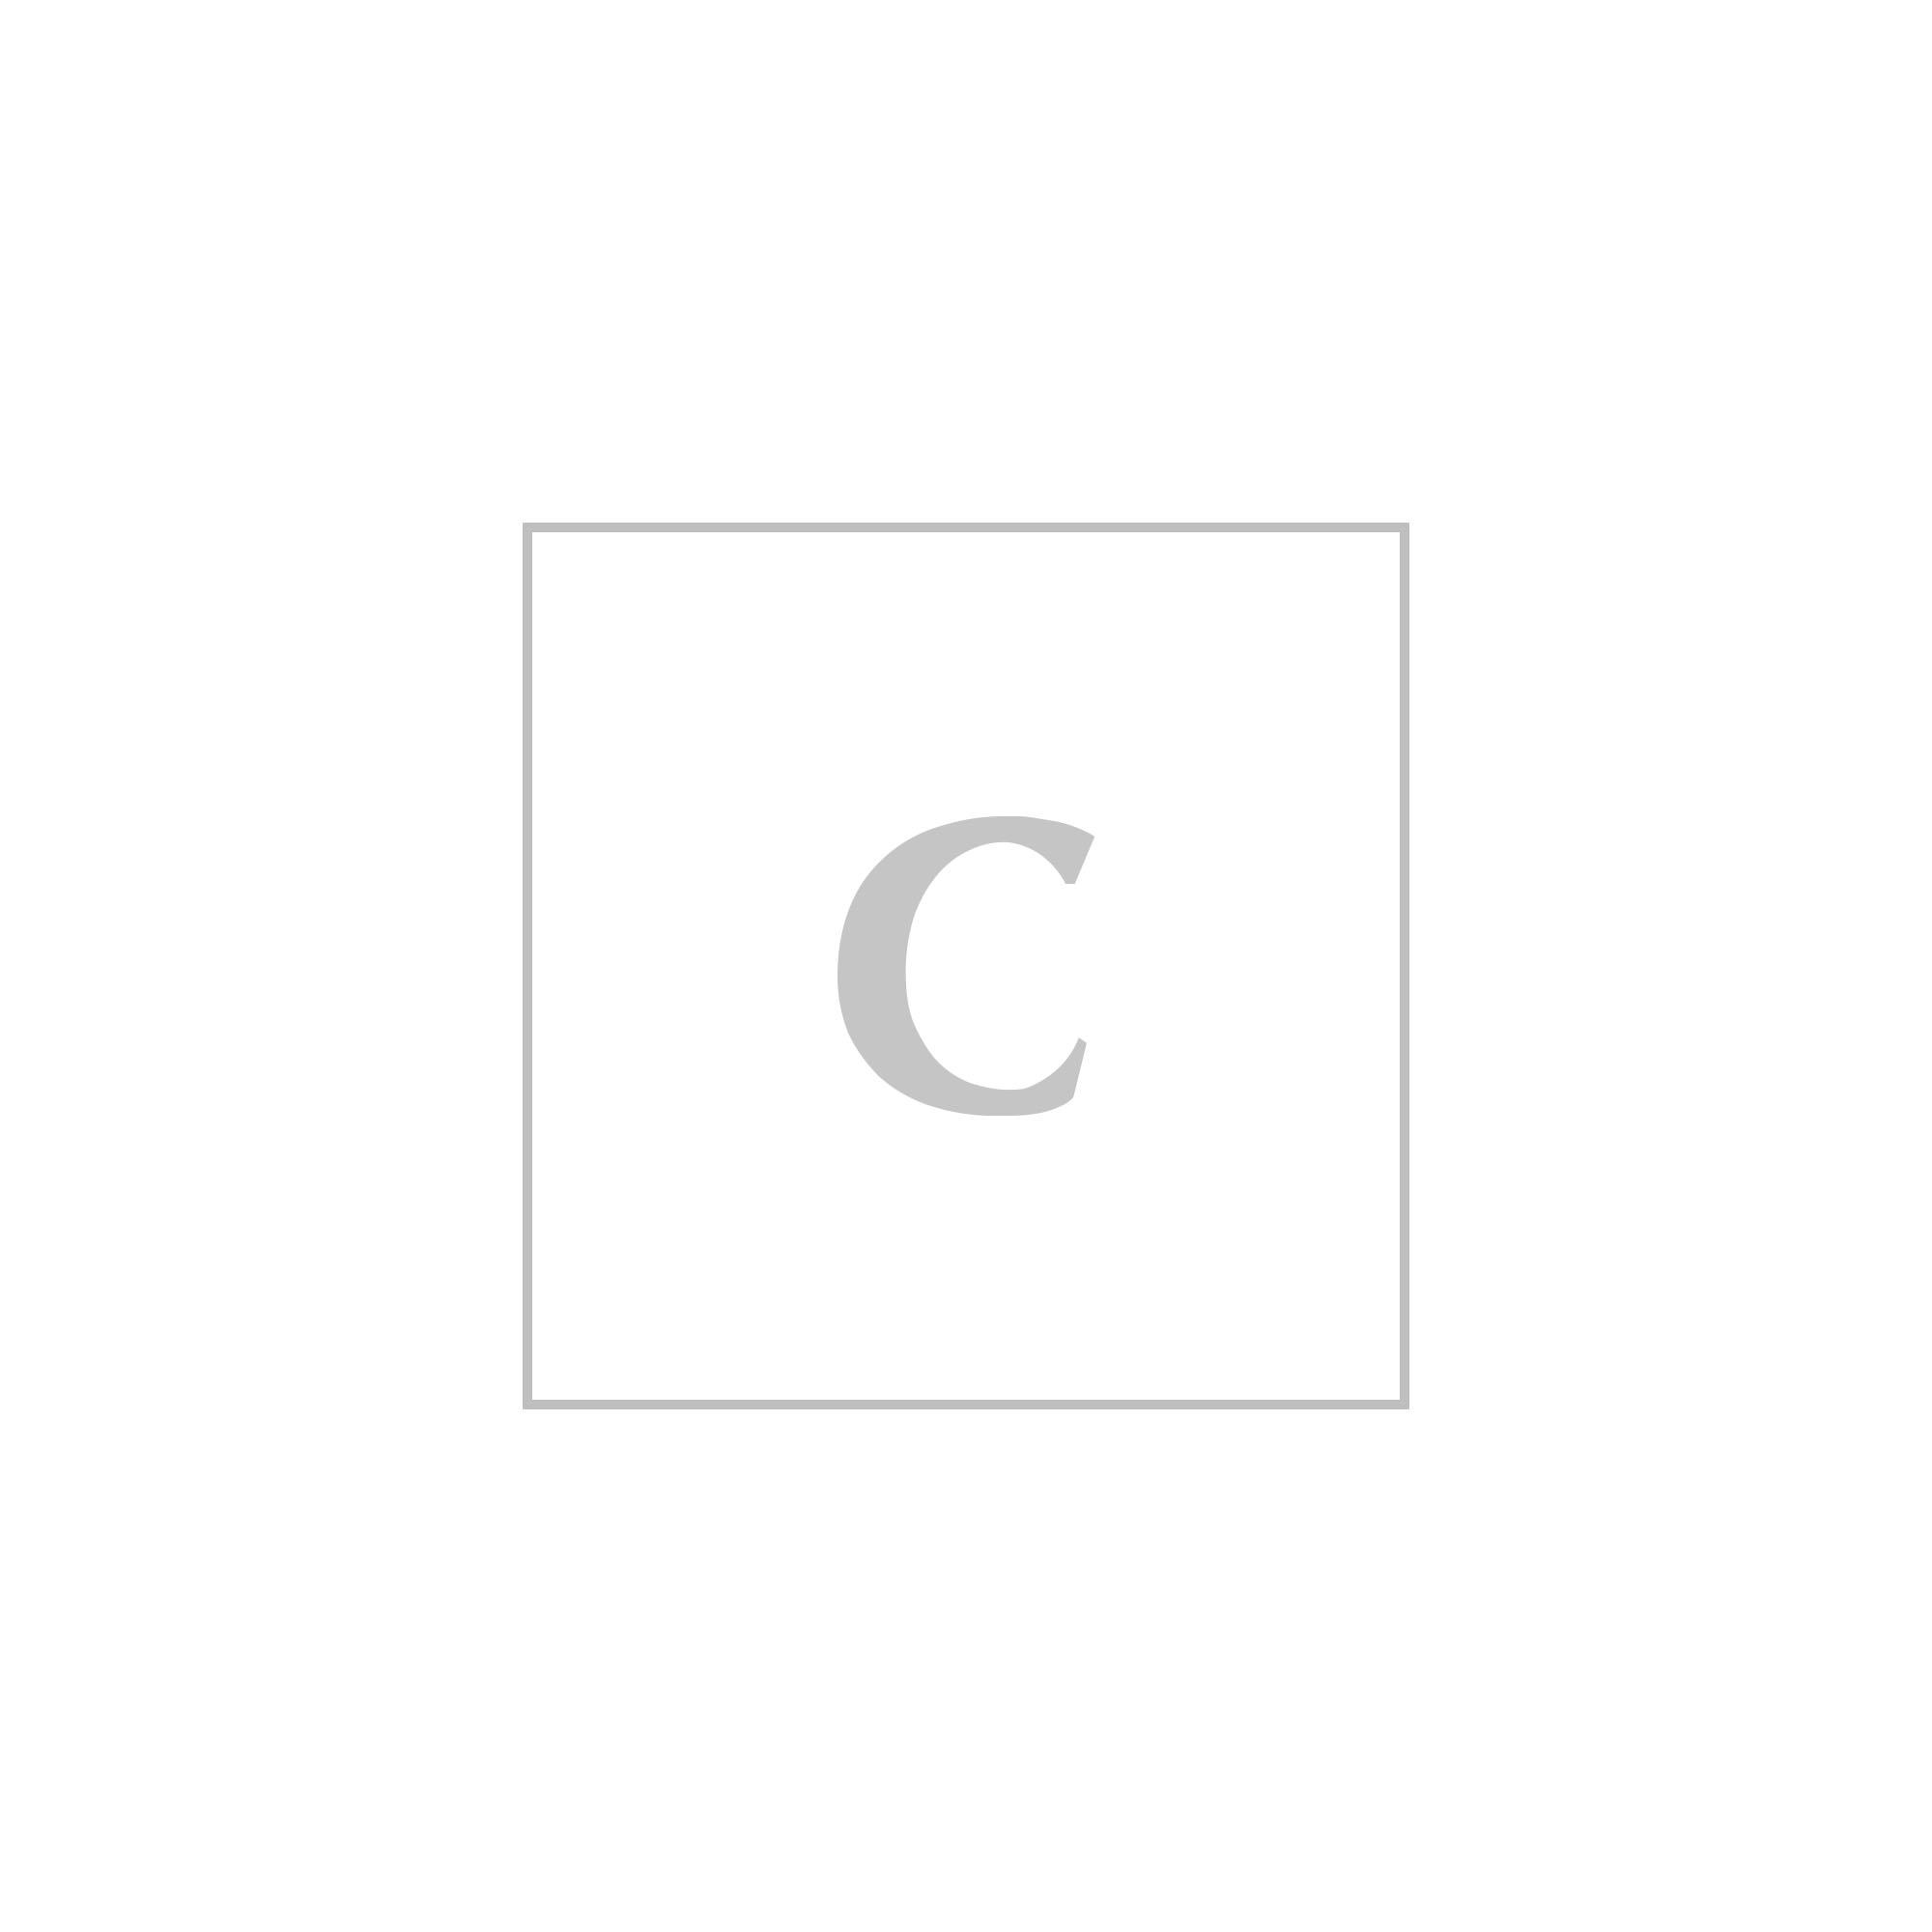 Dolce & gabbana borsa sicily media stampa chevron